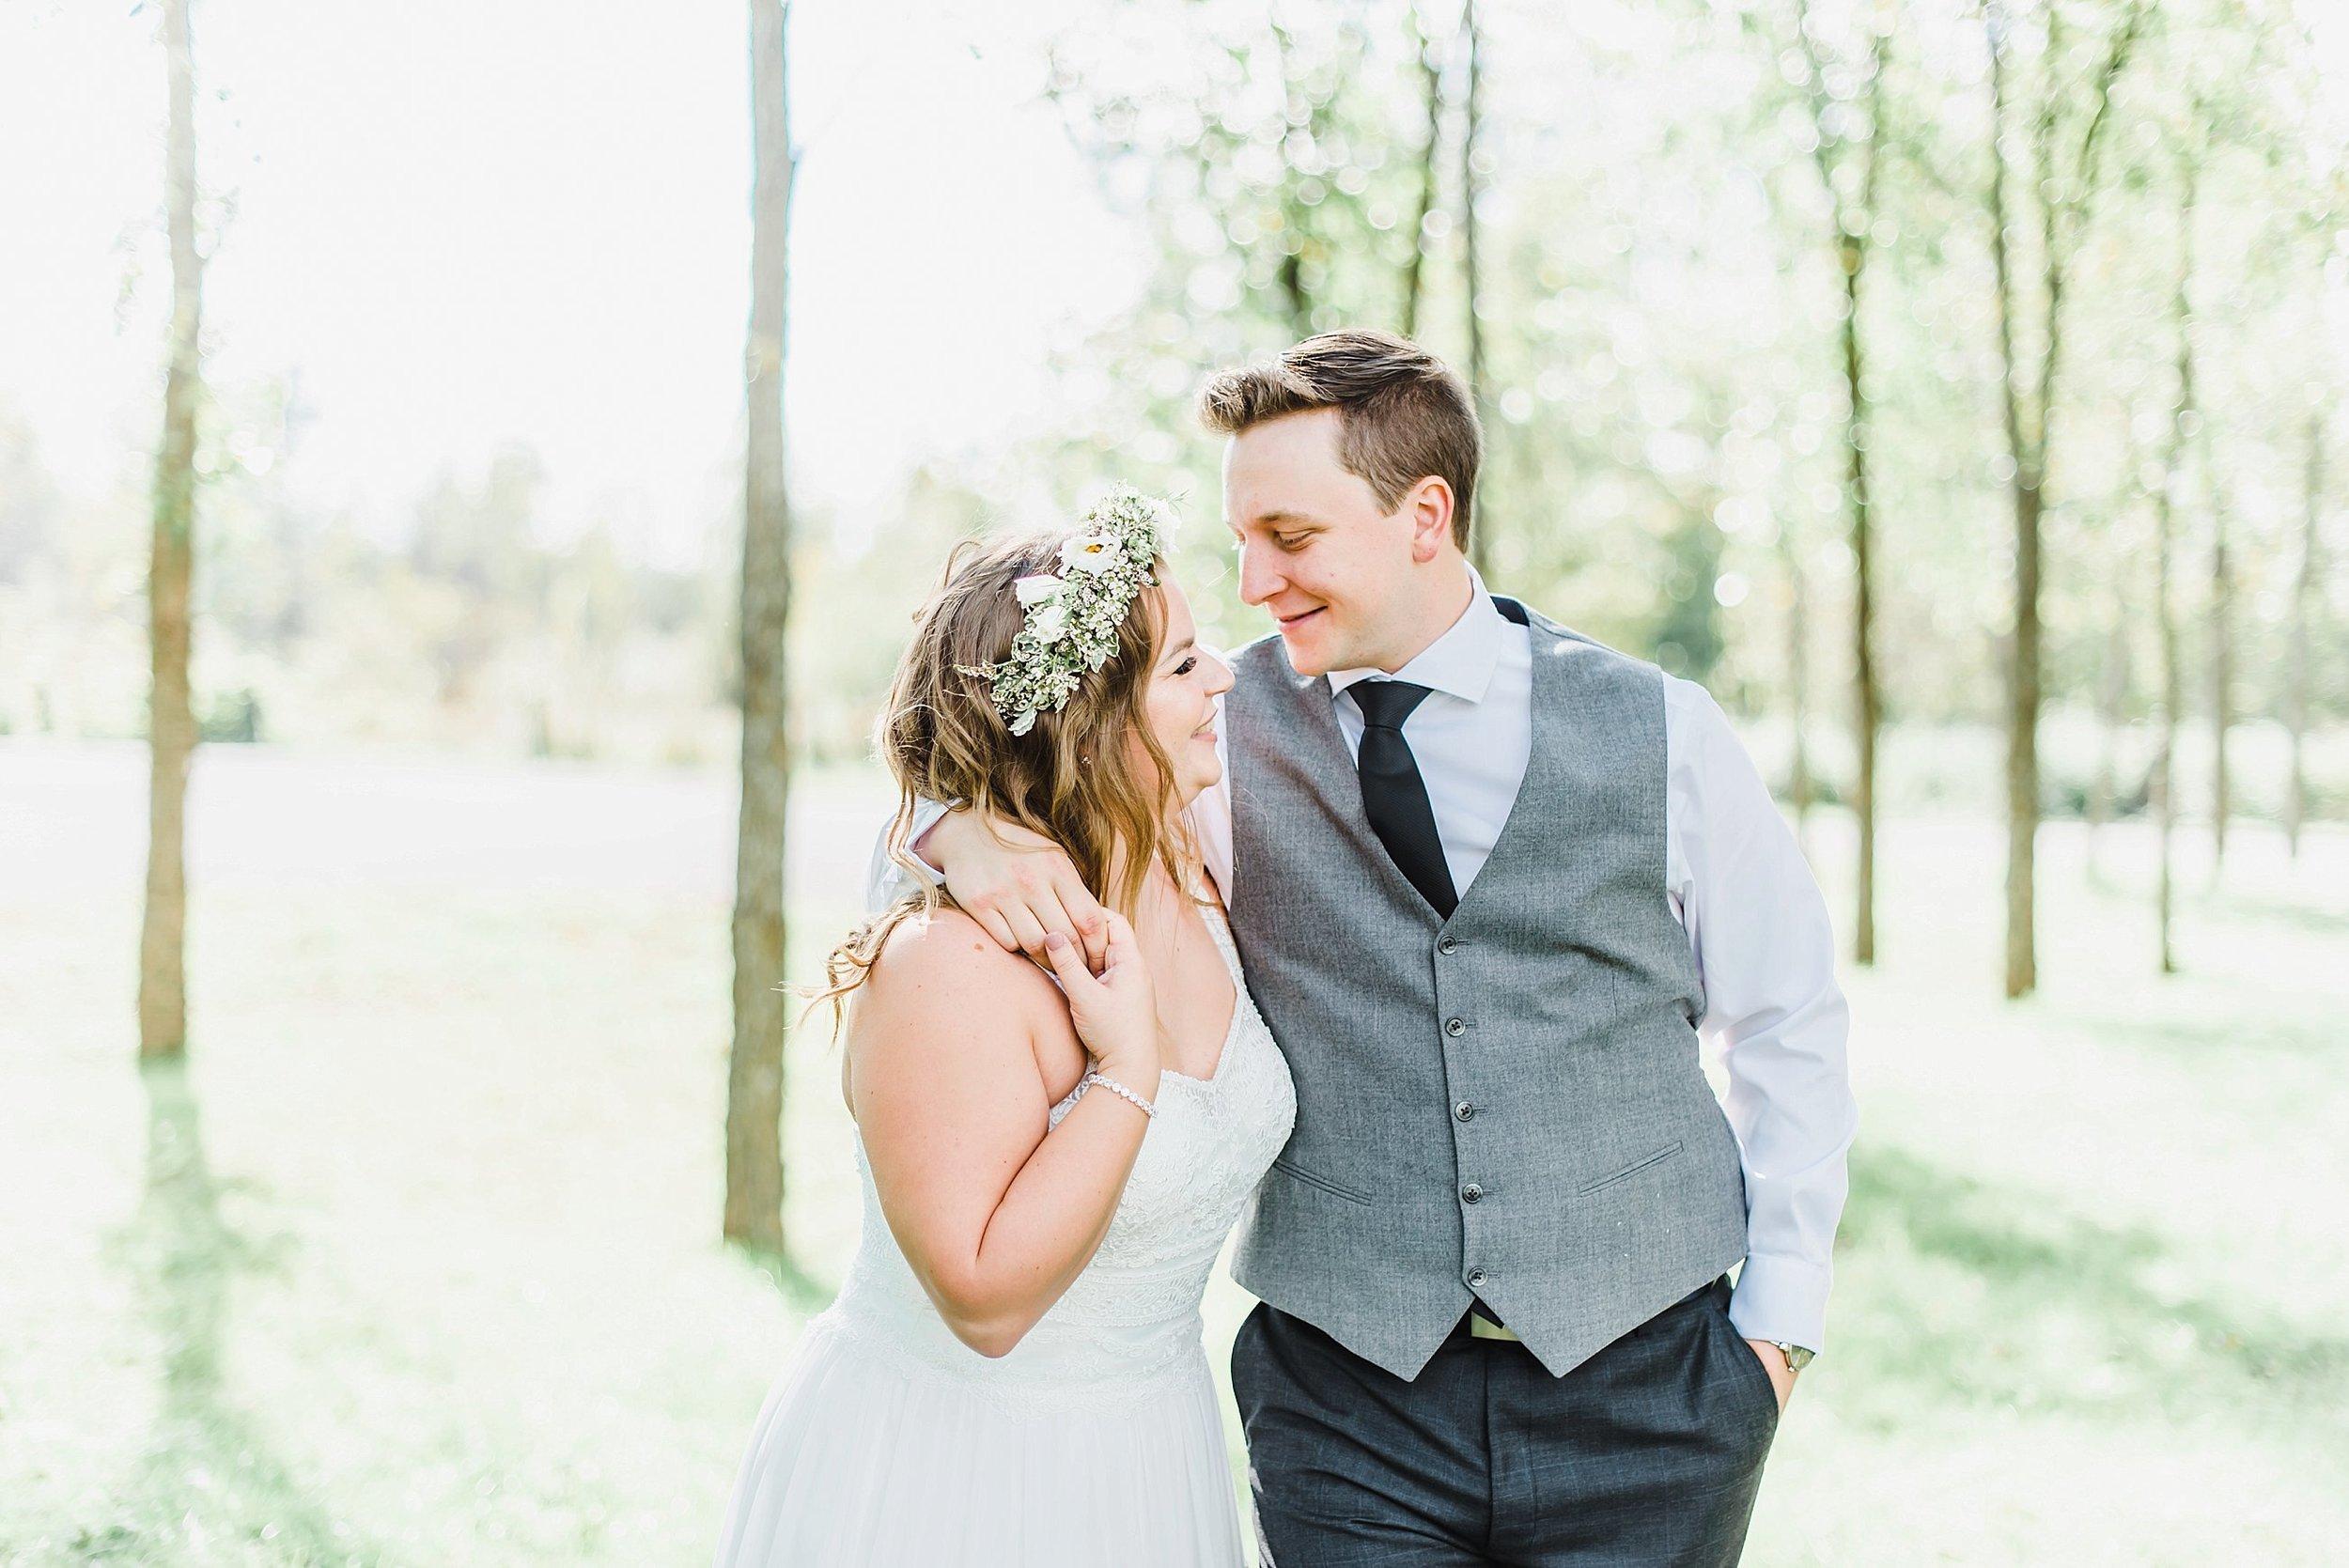 light airy indie fine art ottawa wedding photographer | Ali and Batoul Photography_1112.jpg